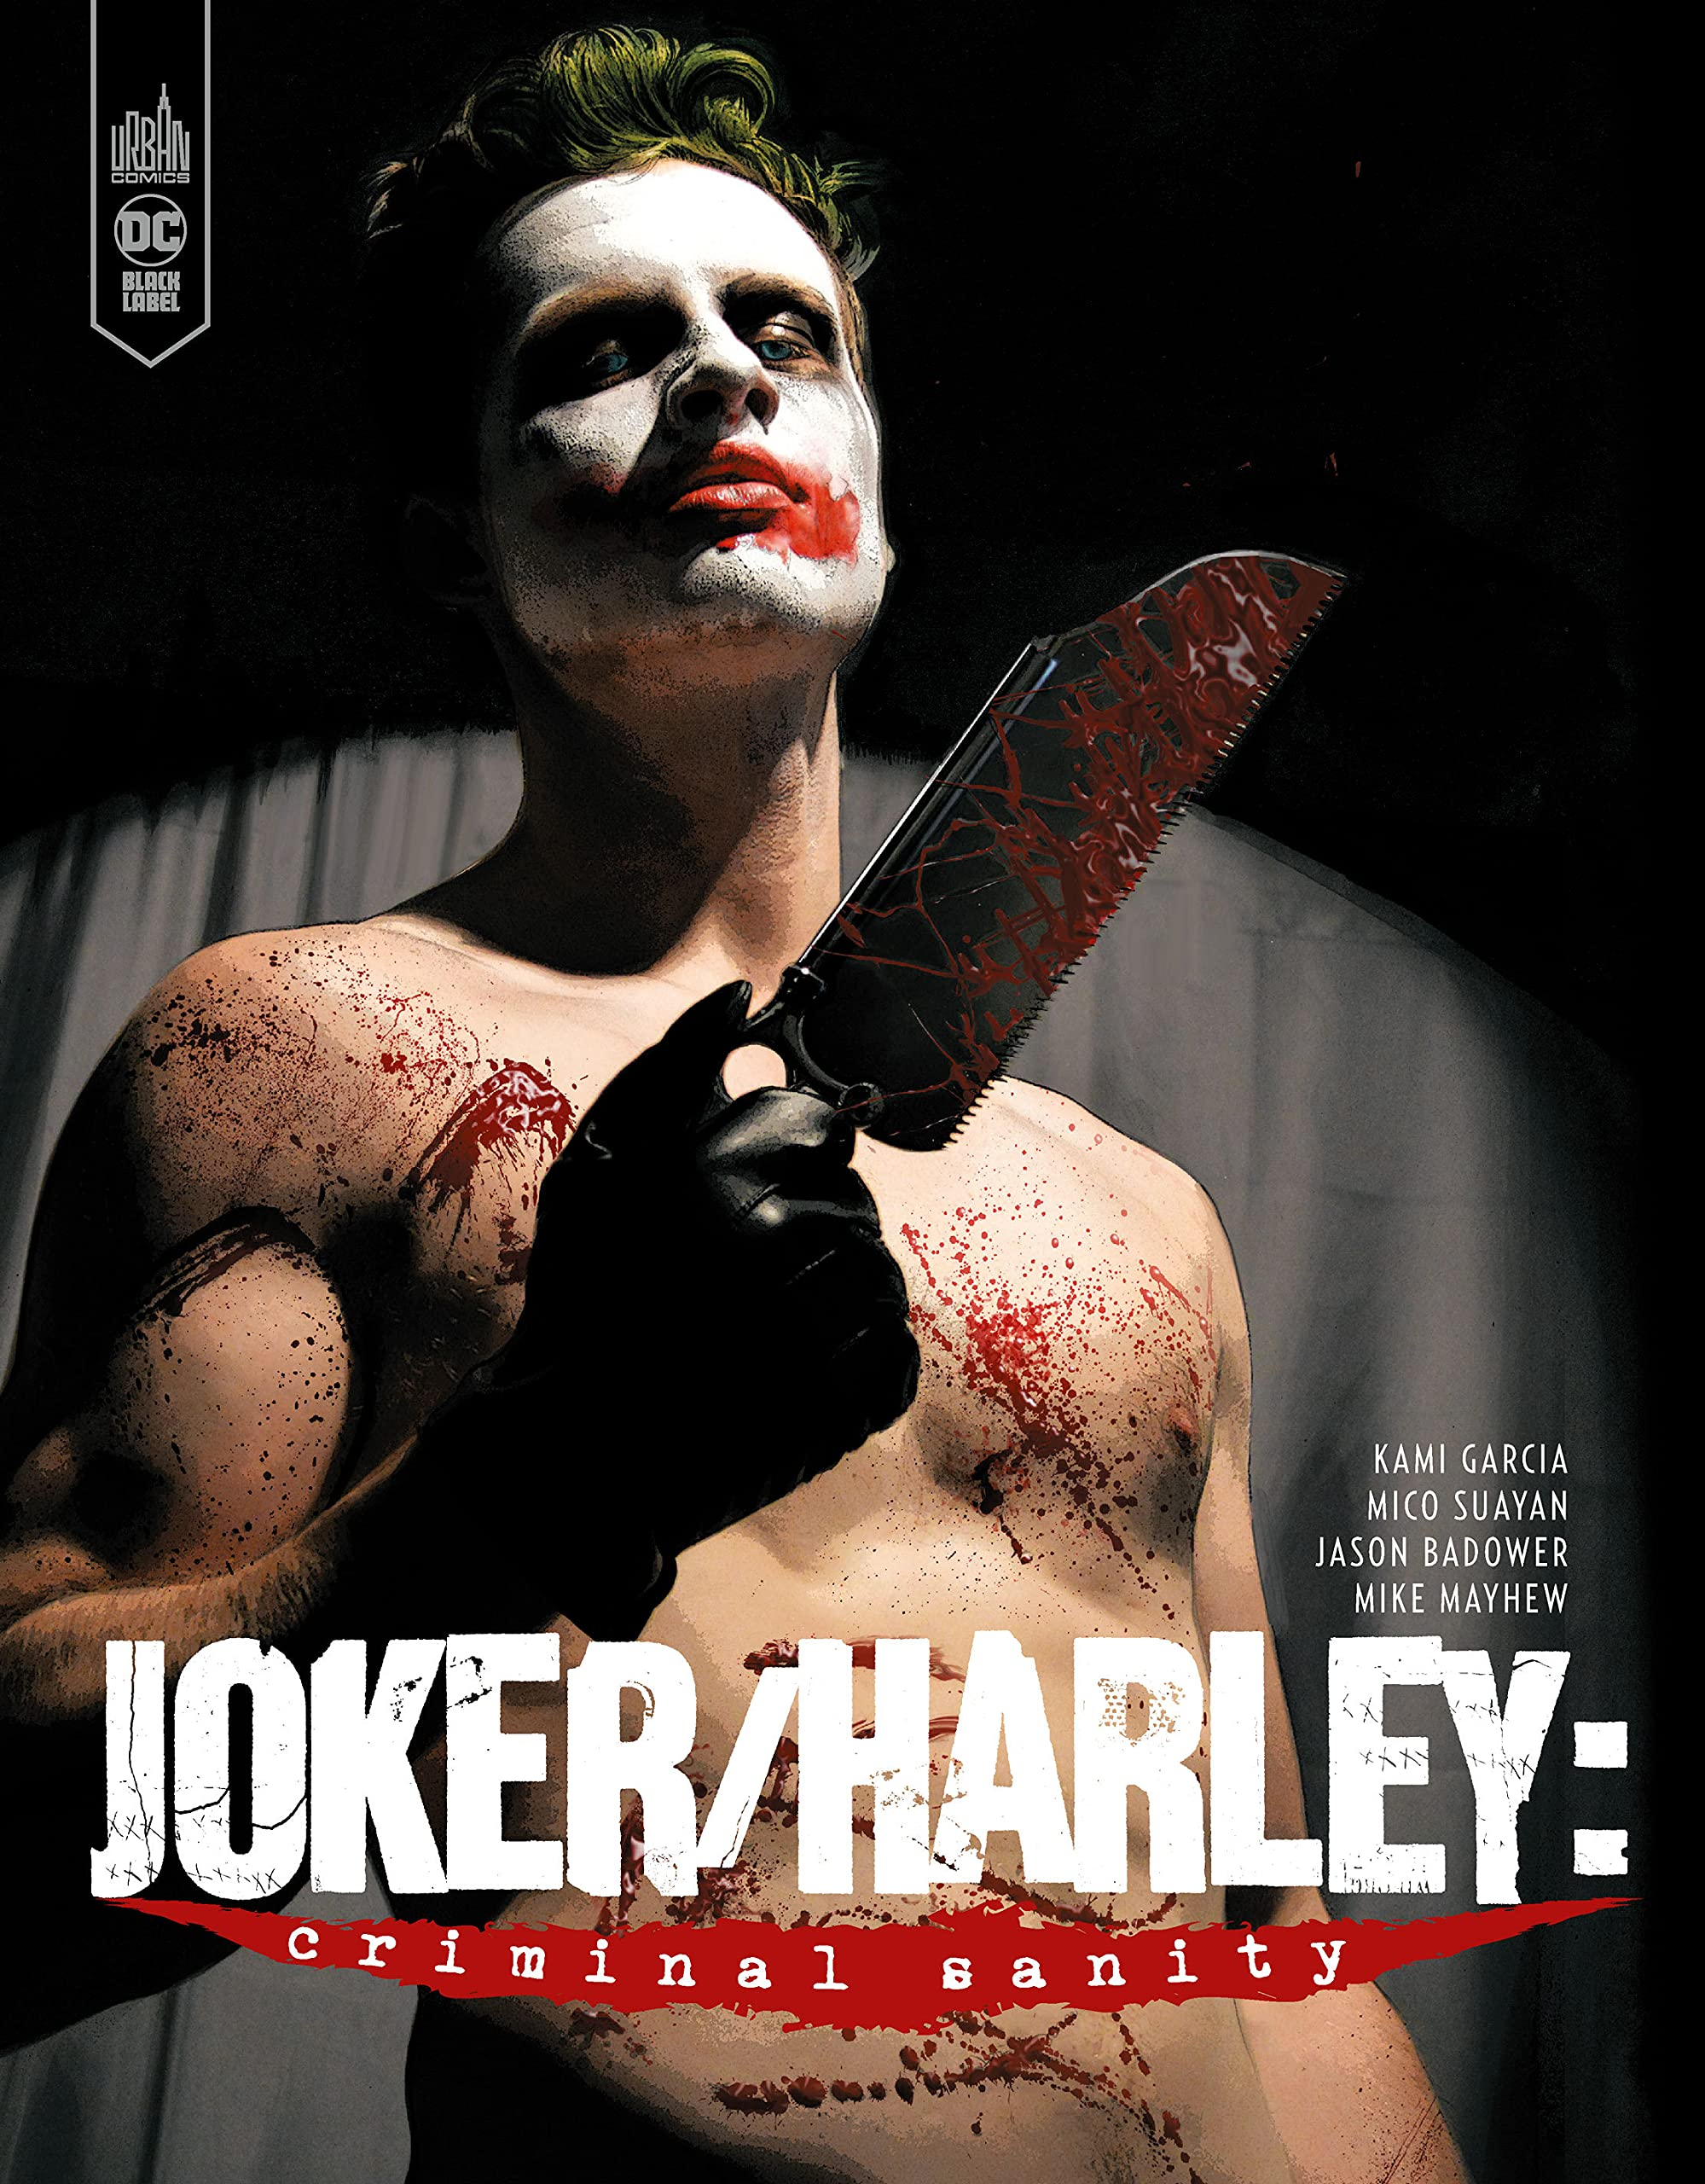 Harley / Joker - Criminal sanity 1